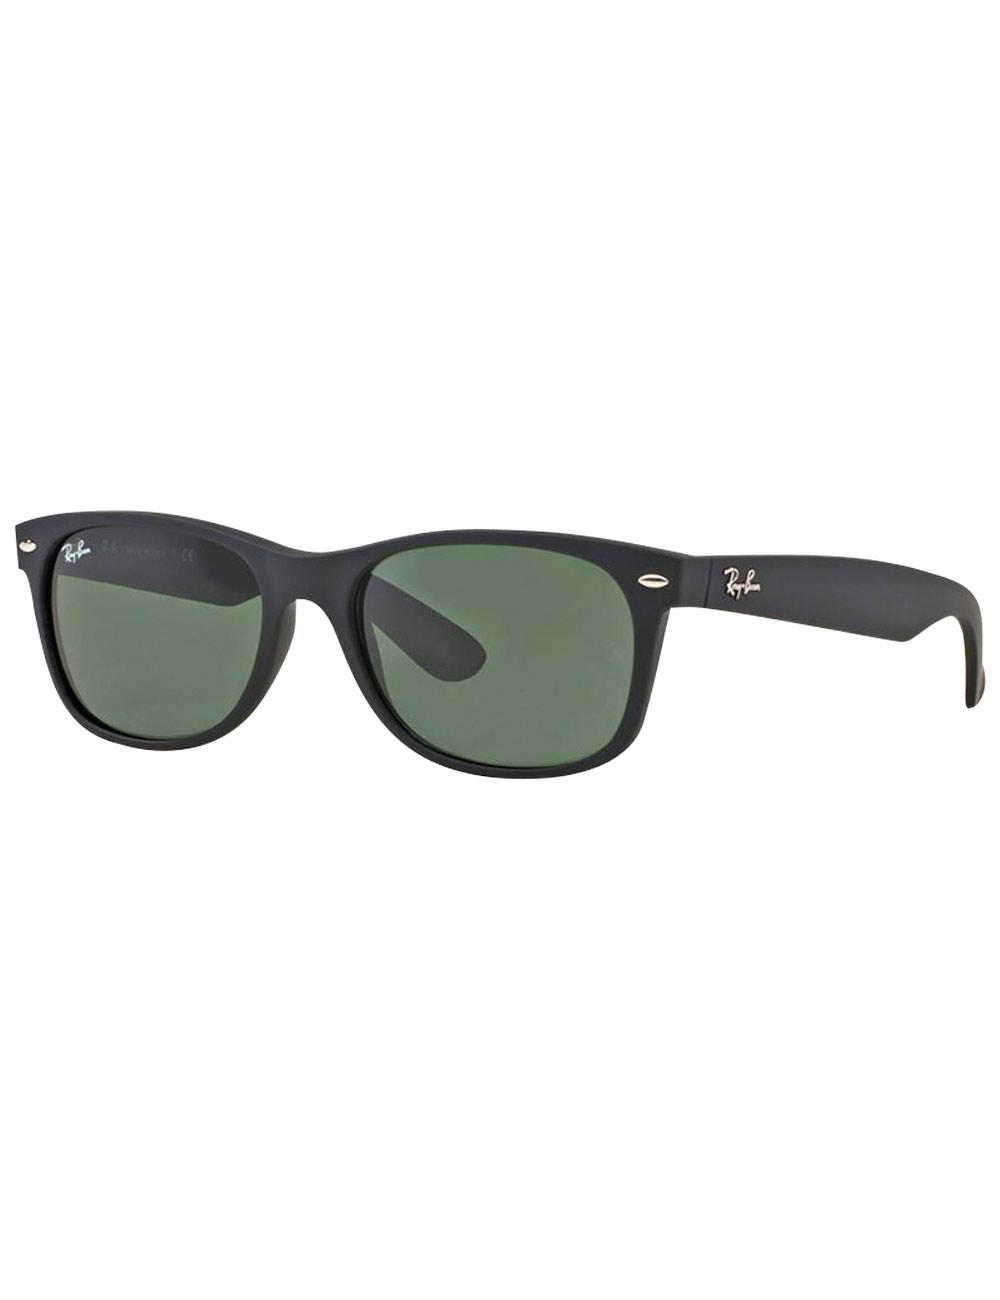 545f8a6b3d02ff Sonnenbrille «New Wayfarer» von Ray Ban, schwarz/grün